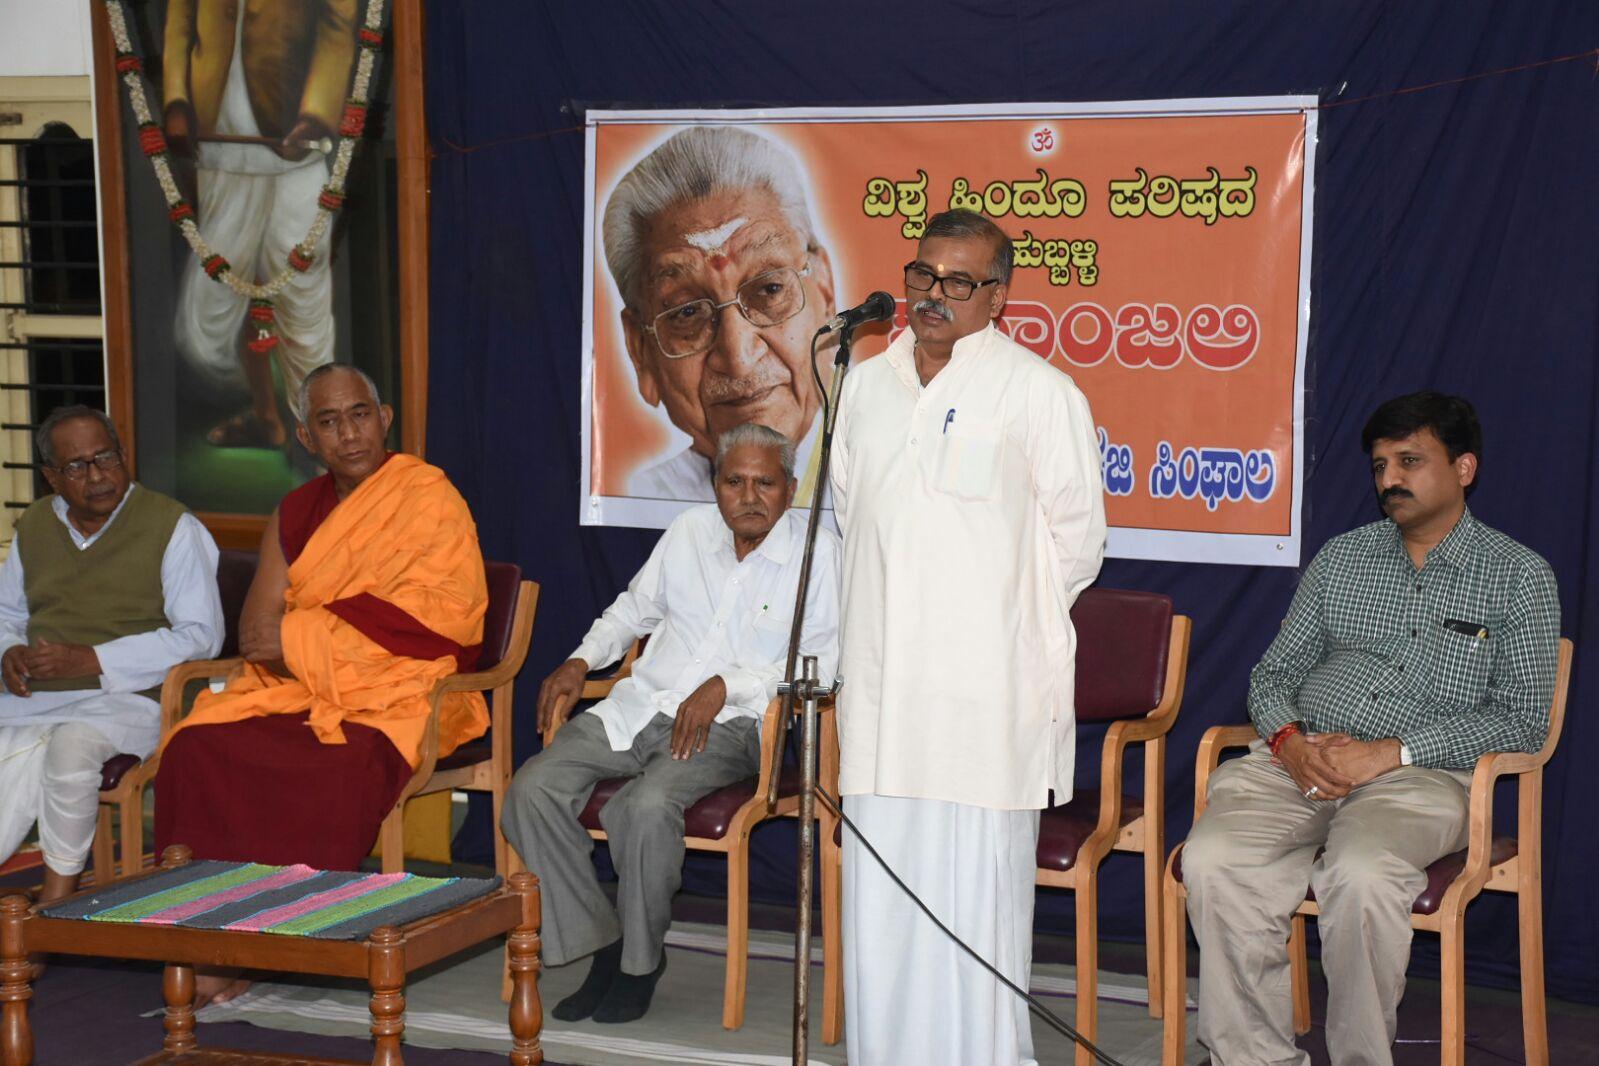 Mangesh Bhende addressing Shraddhanjali Sabha at Hubballi